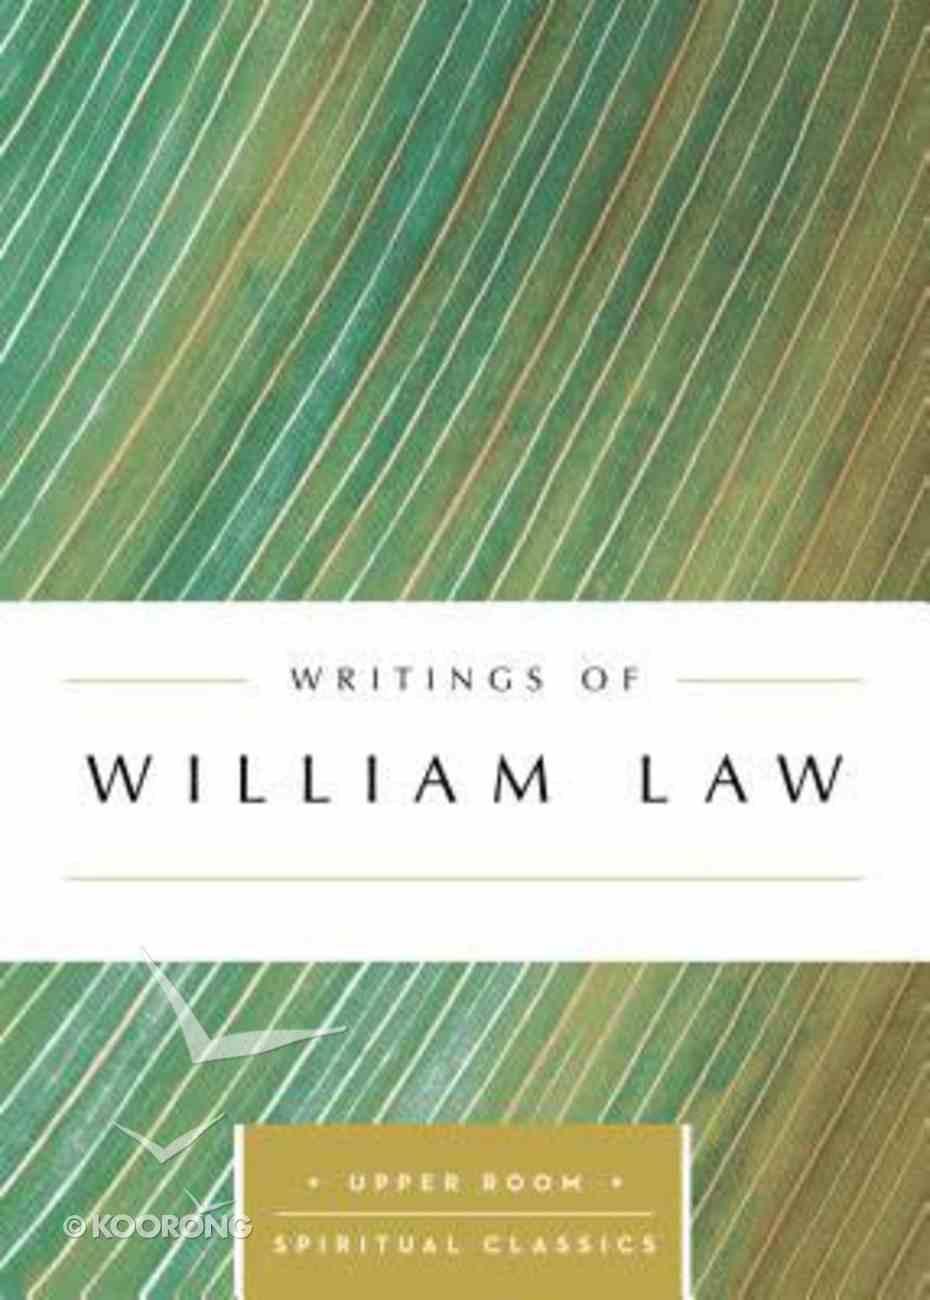 Writings of William Law (Upper Room Spiritual Classics Series) Paperback